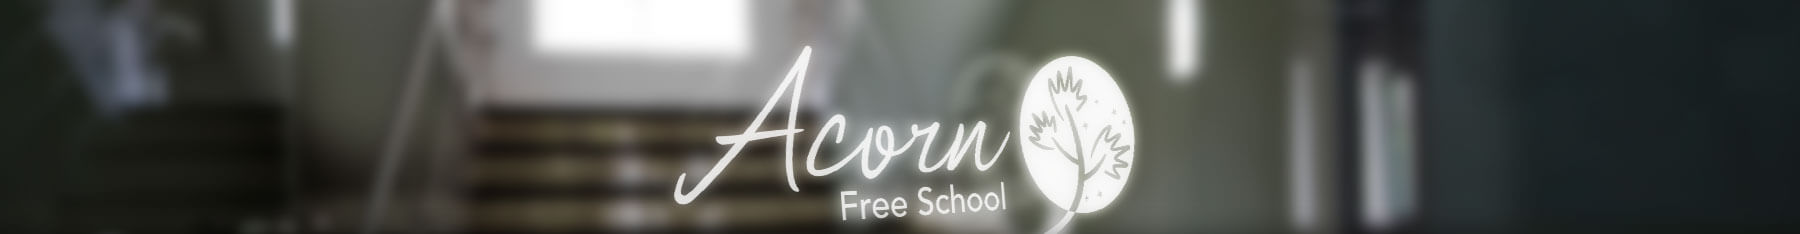 Acorn Free School